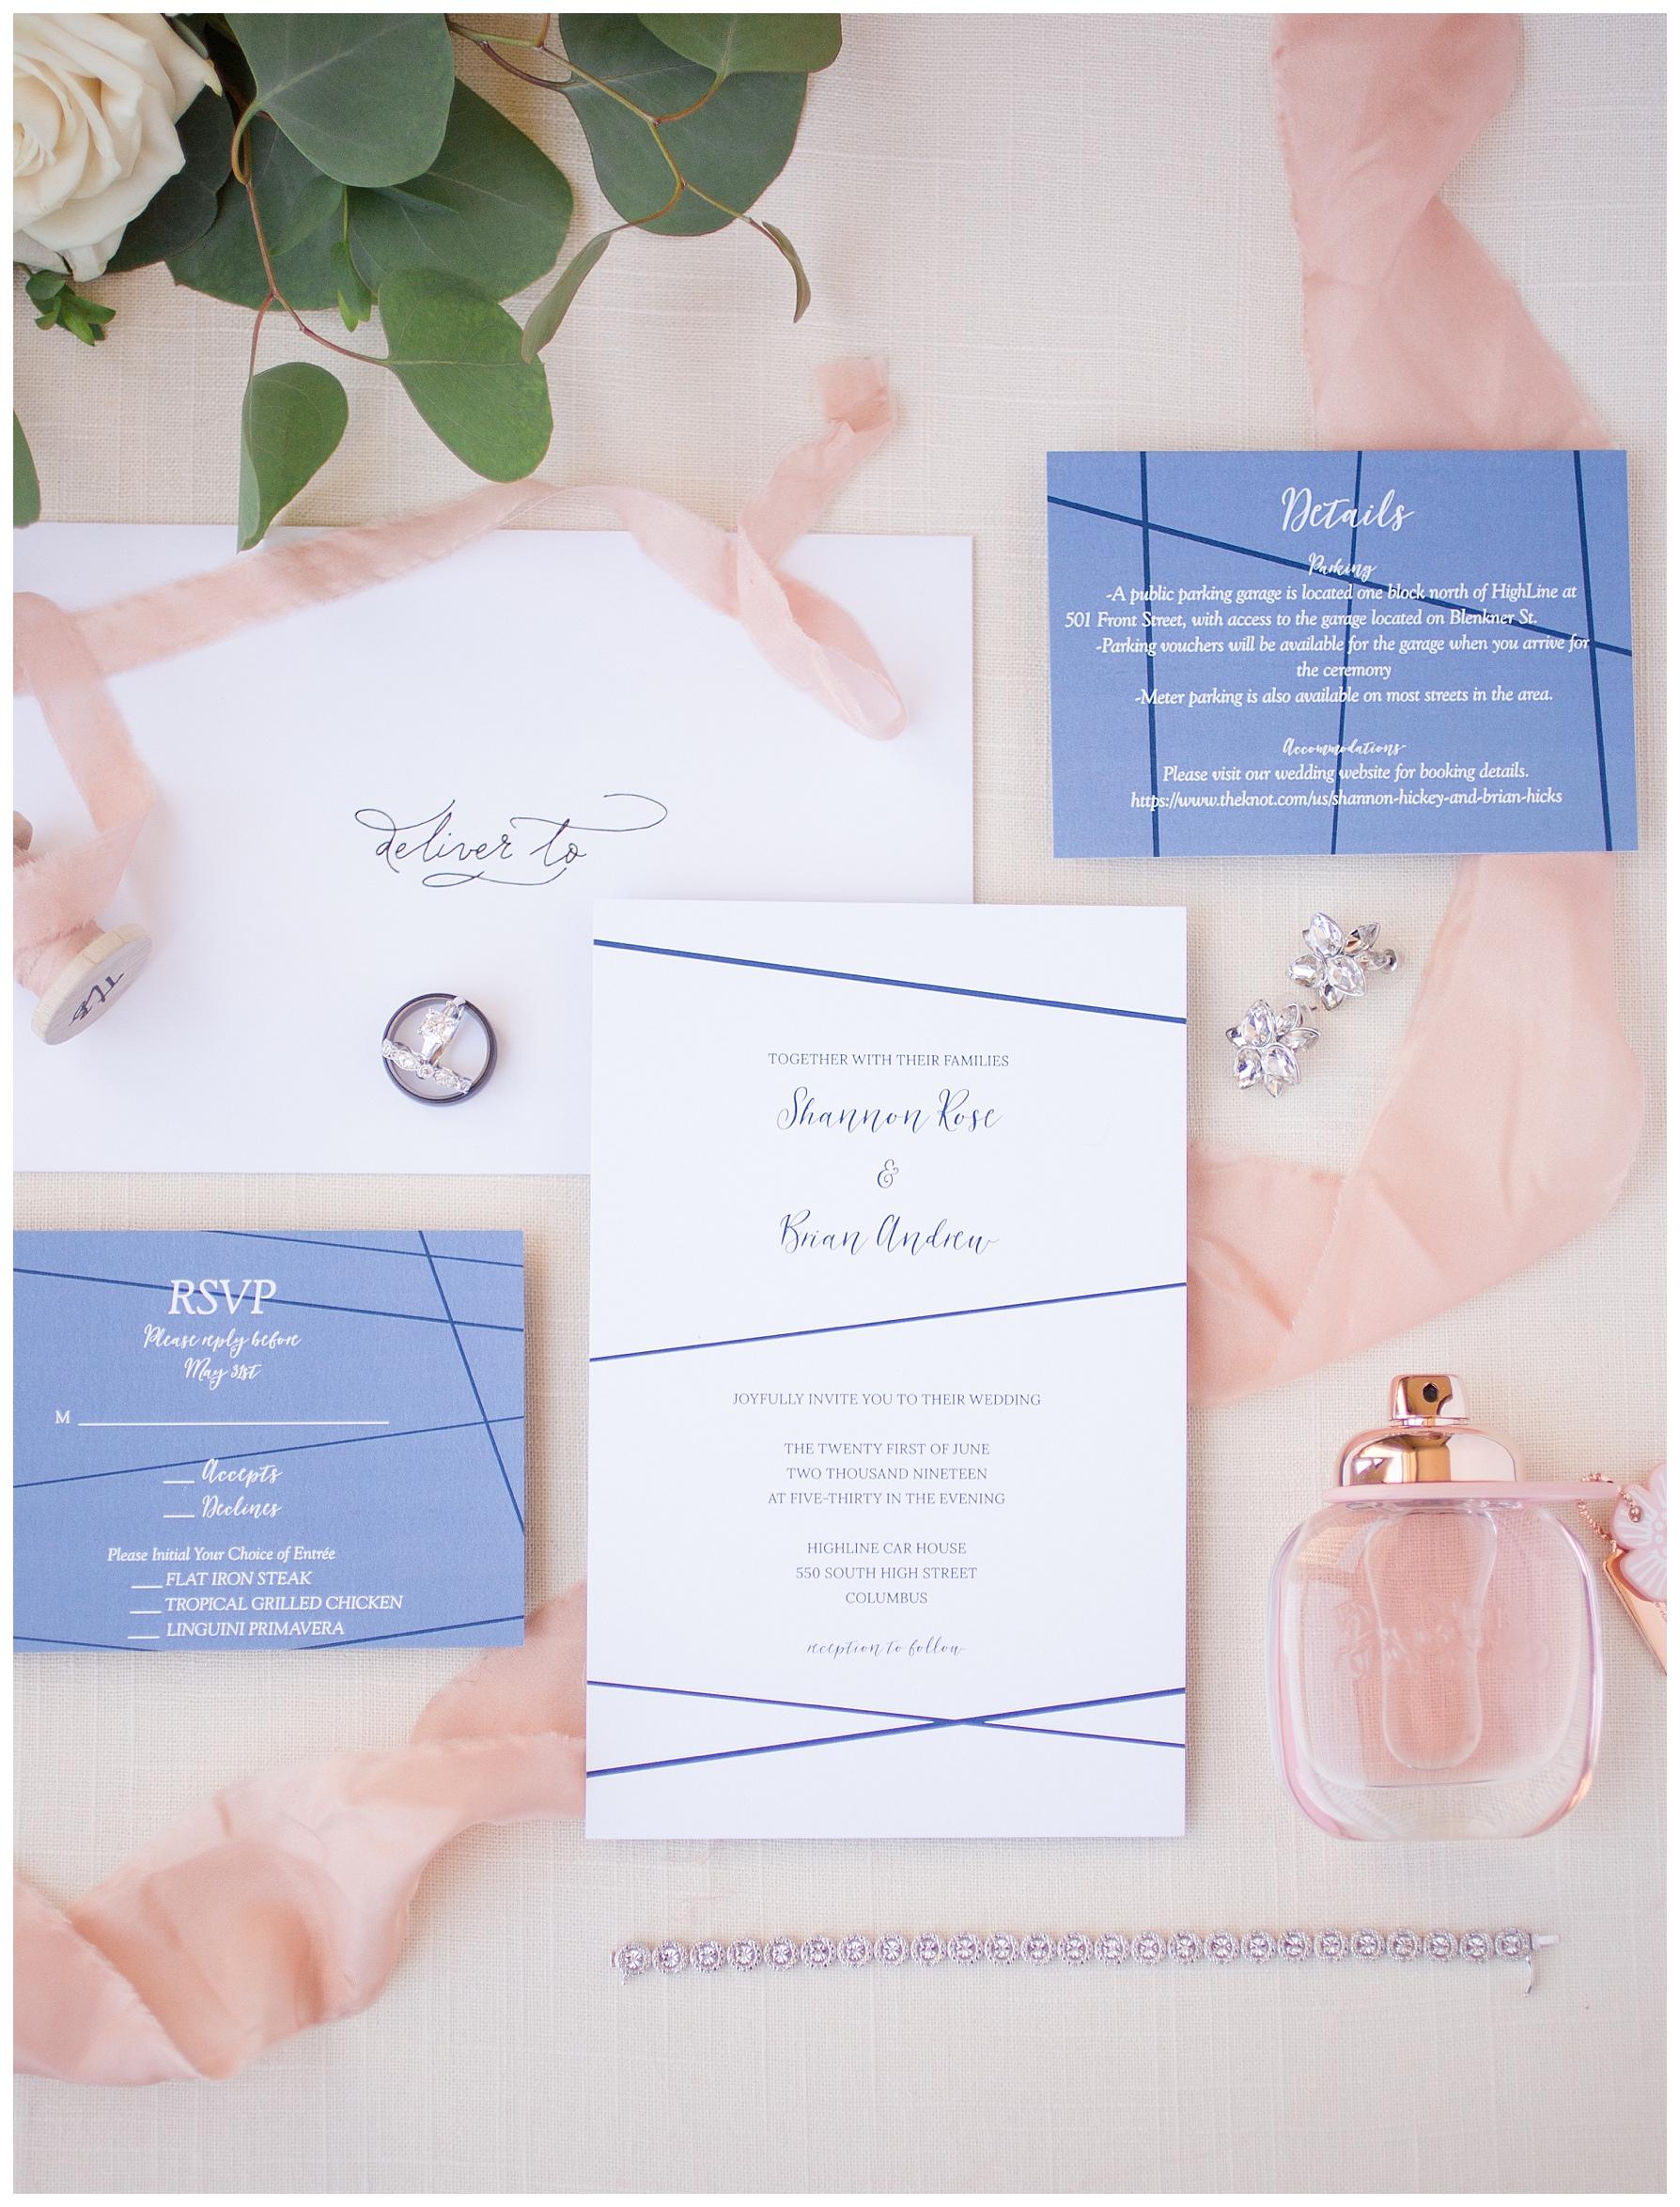 columbus-renaissance-hotel-wedding-invitations_0003.jpg